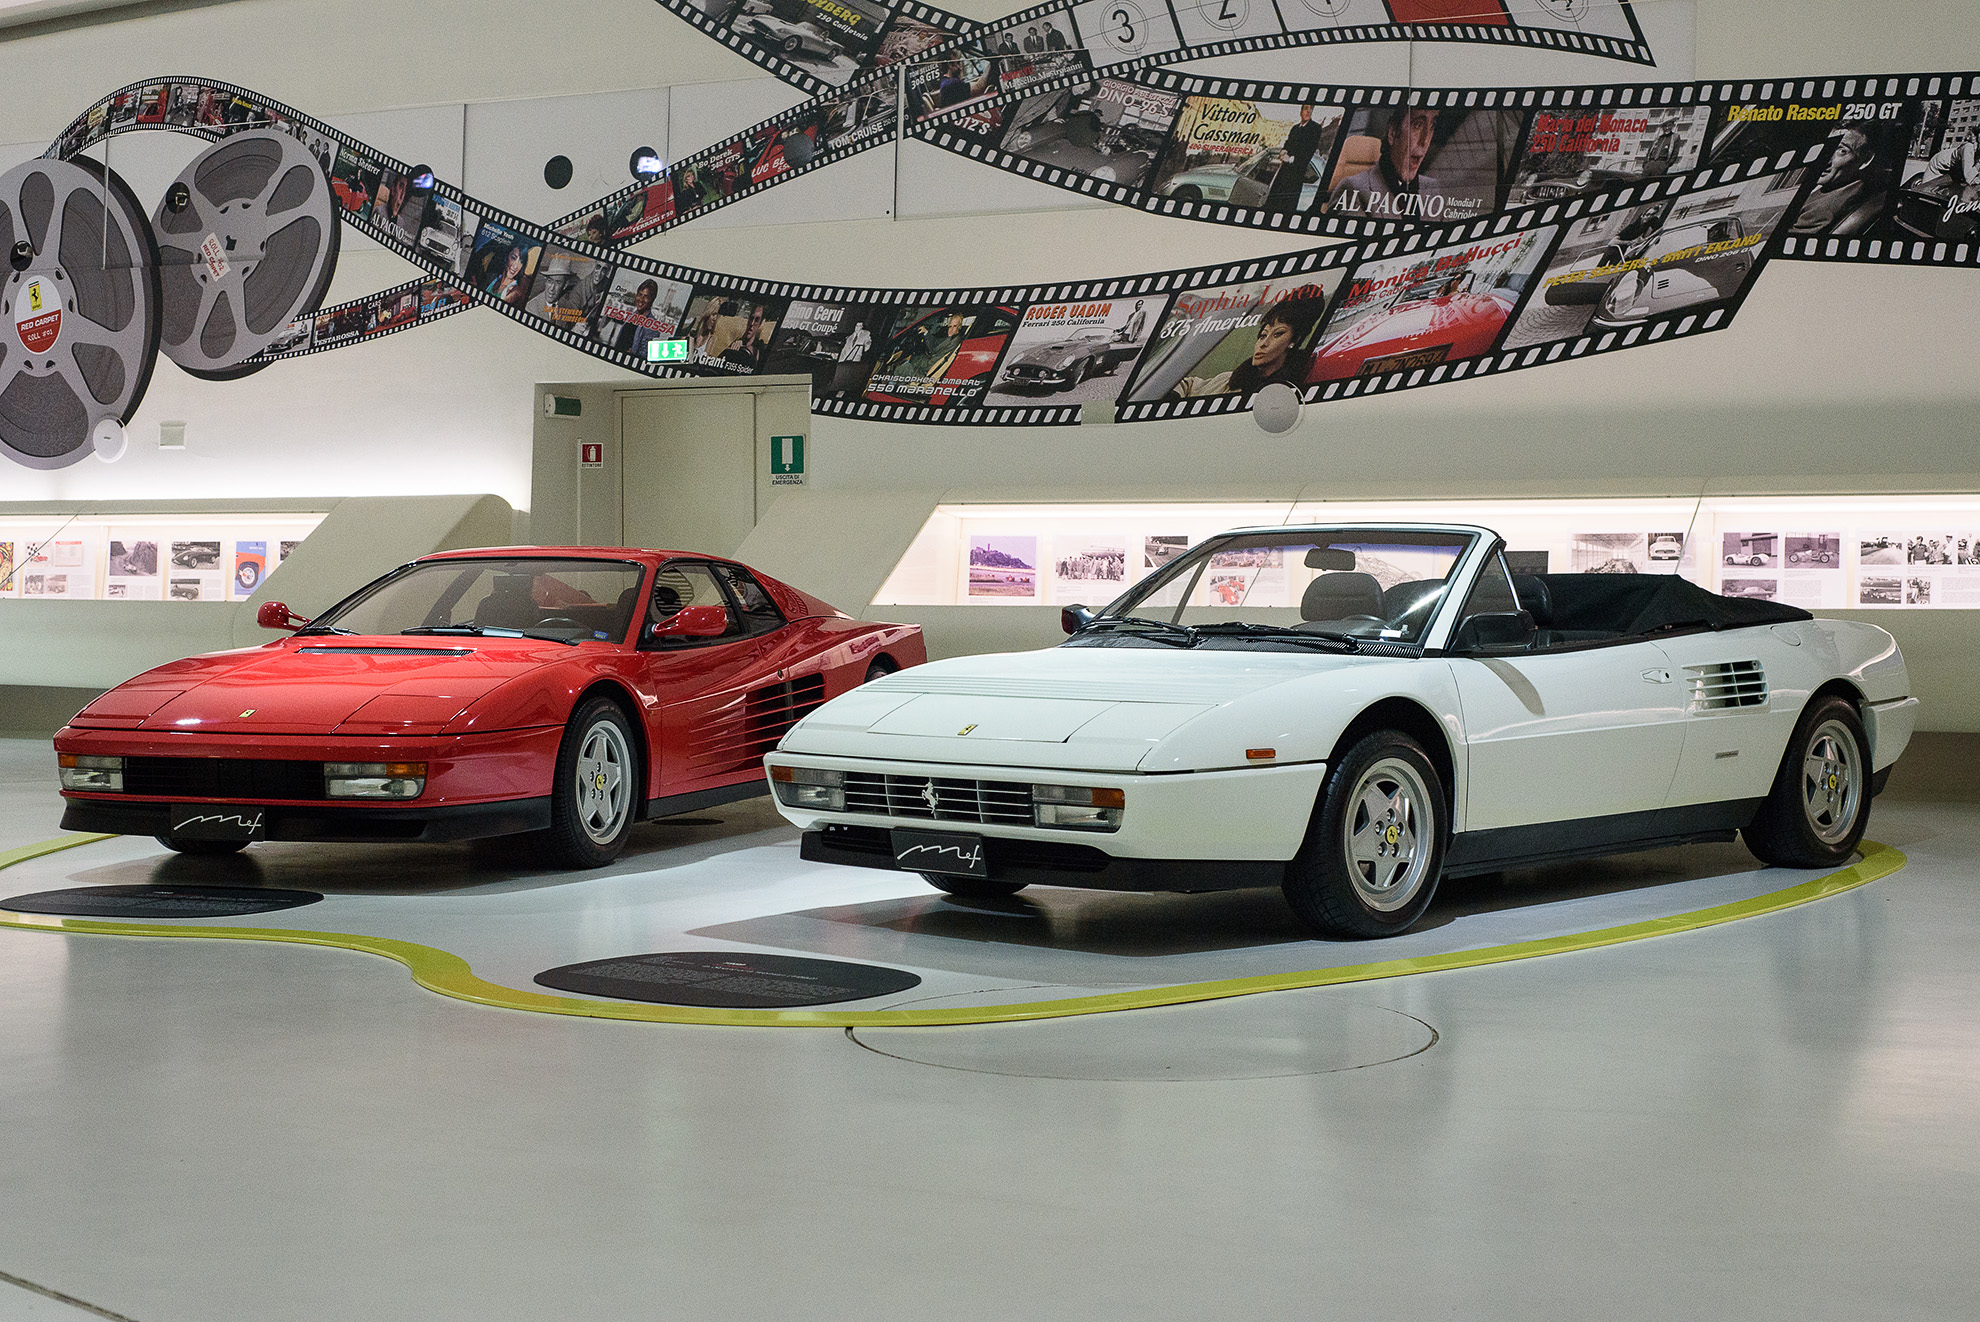 Muse Enzo Ferrrari - Ferrari Testarossa i Ferrari Mondial T